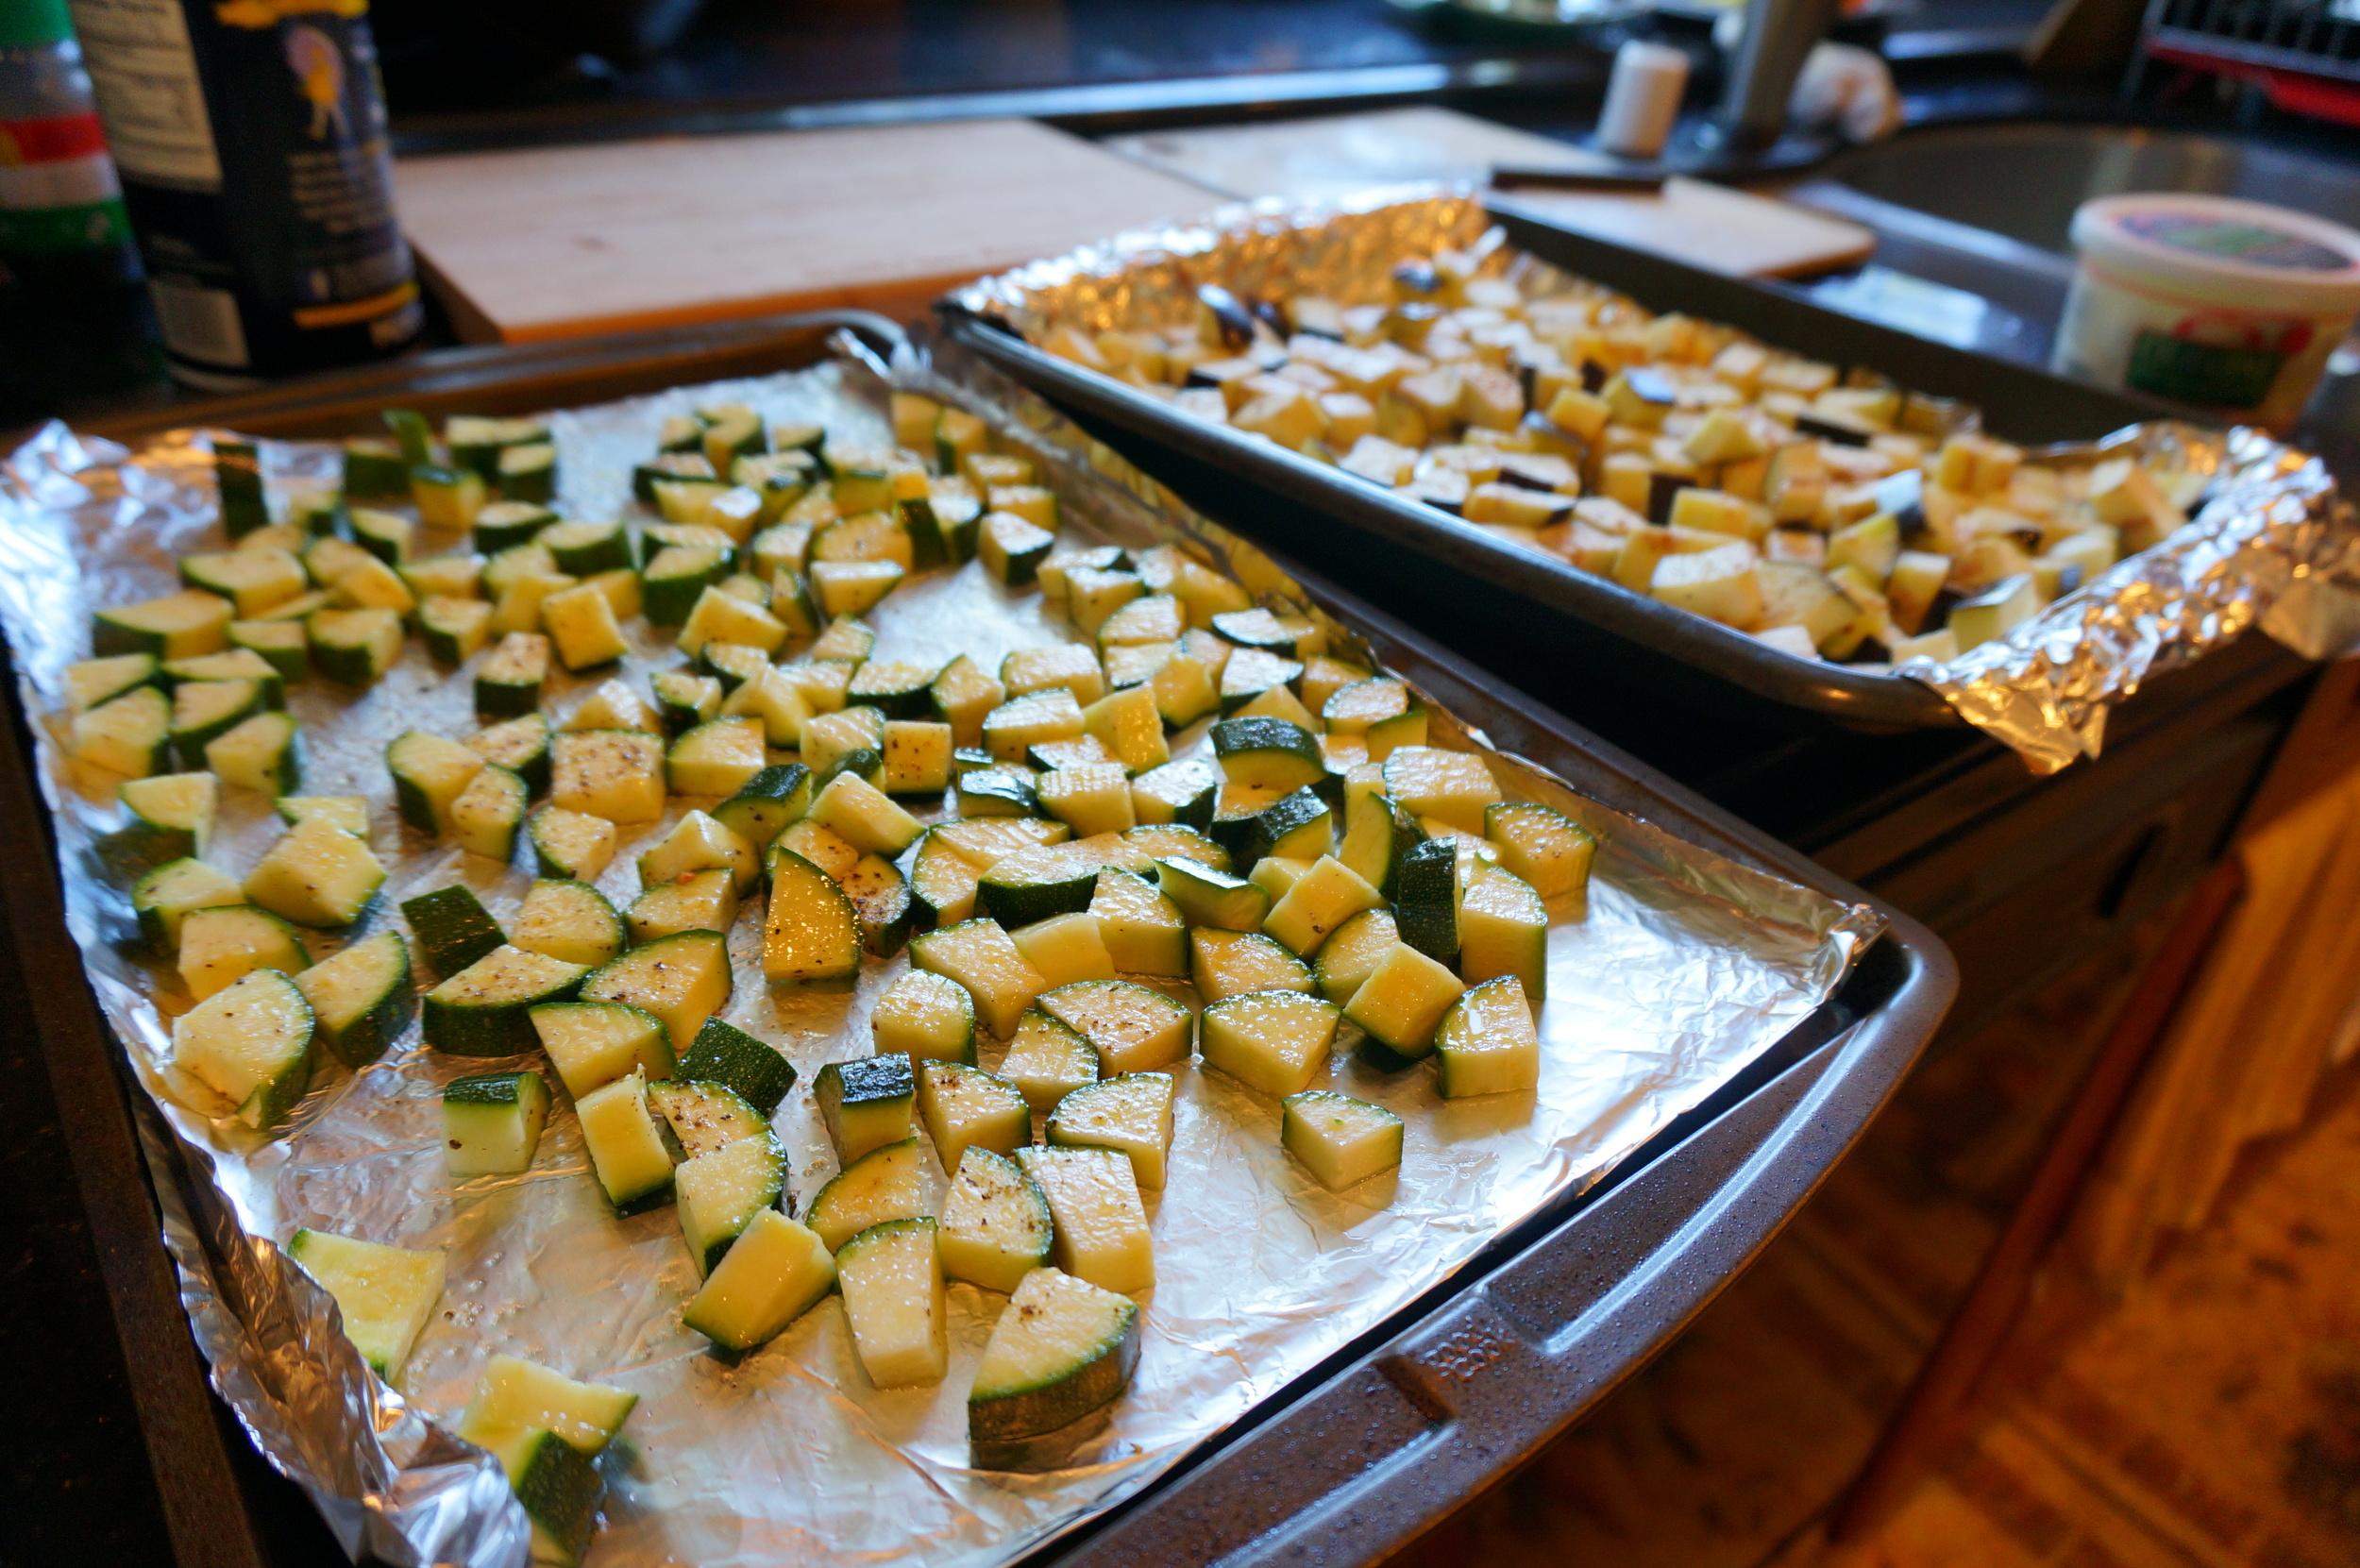 Roasted Zucchini and Eggplant for Mediterranean Barley Salad